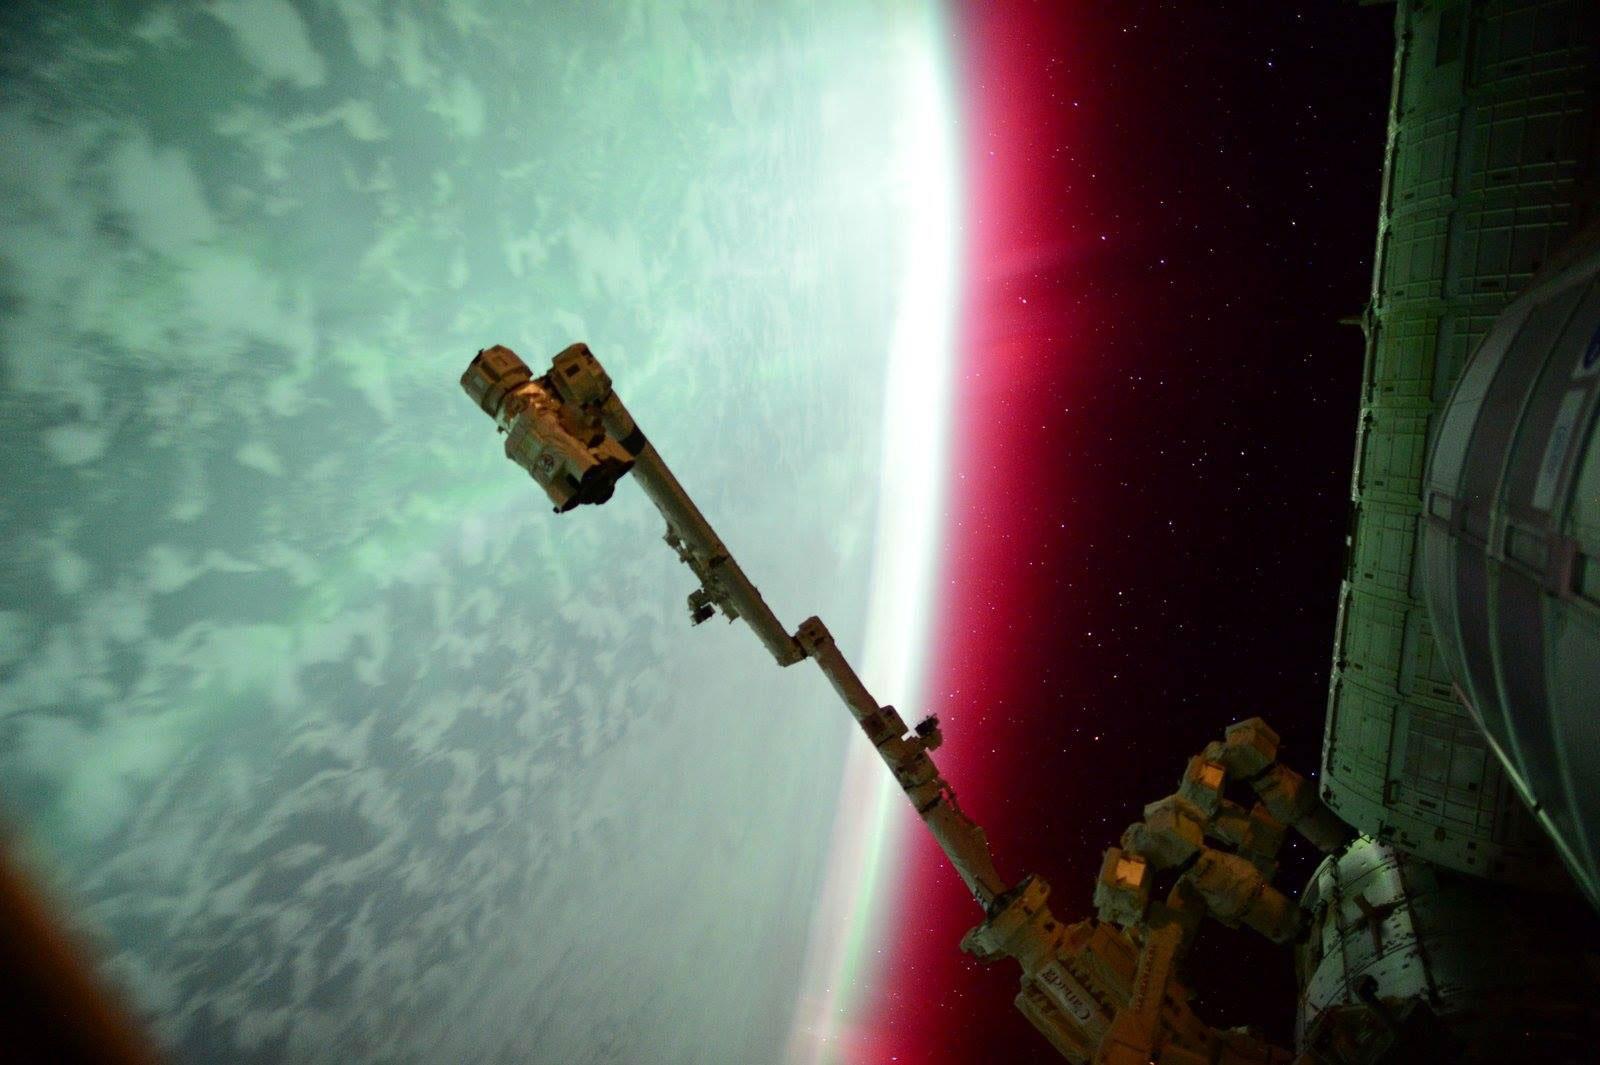 Autora na Terra vista desde a Estacion Espacial Internacional